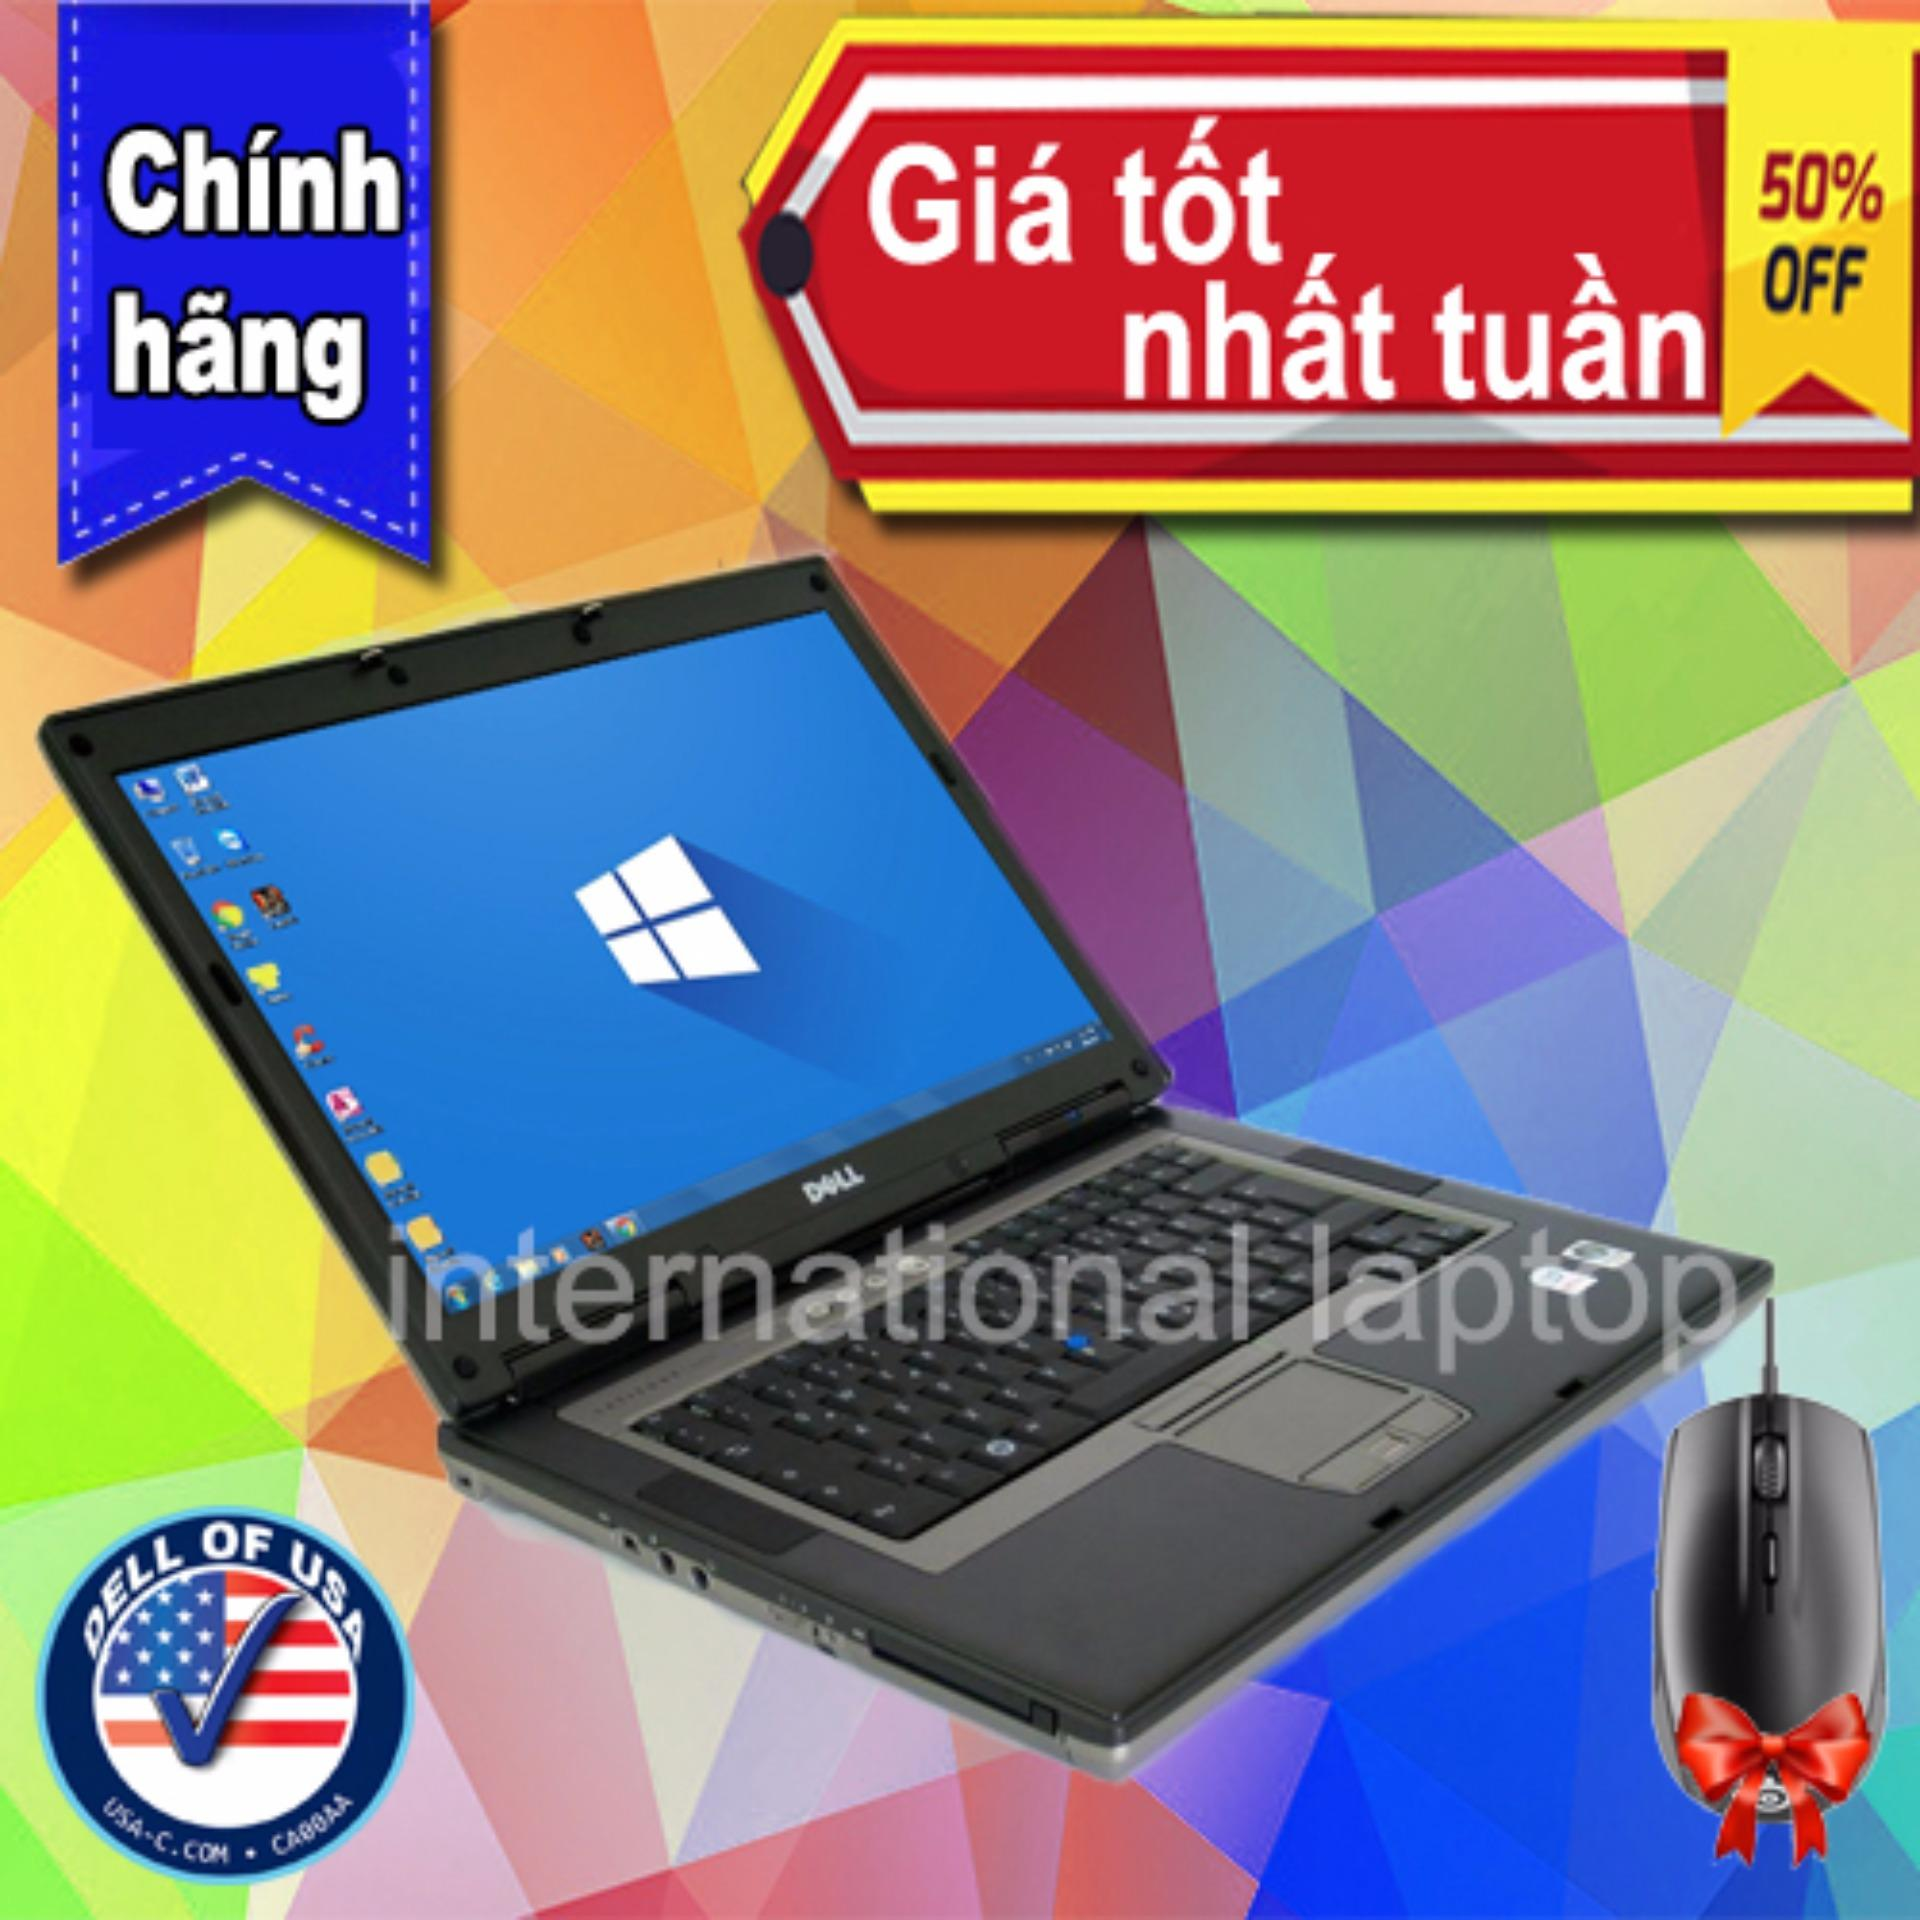 Laptop Dell Latitude D830 C2 2 250 Hang Nhập Khẩu Dell Chiết Khấu 30